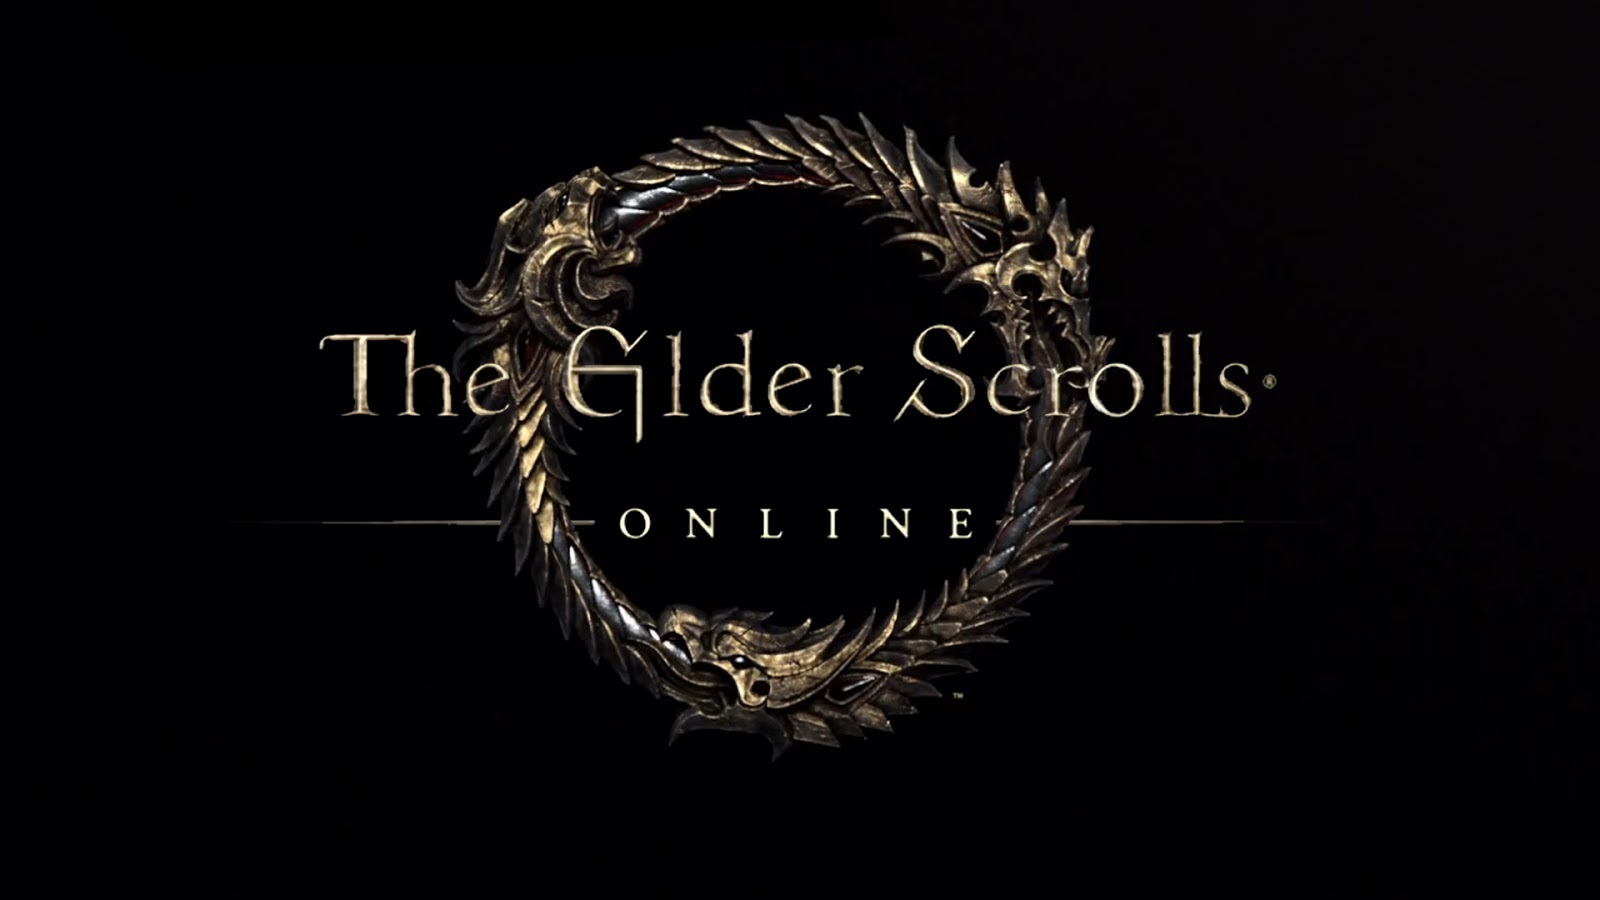 The Elder Scrolls Online Free Beta